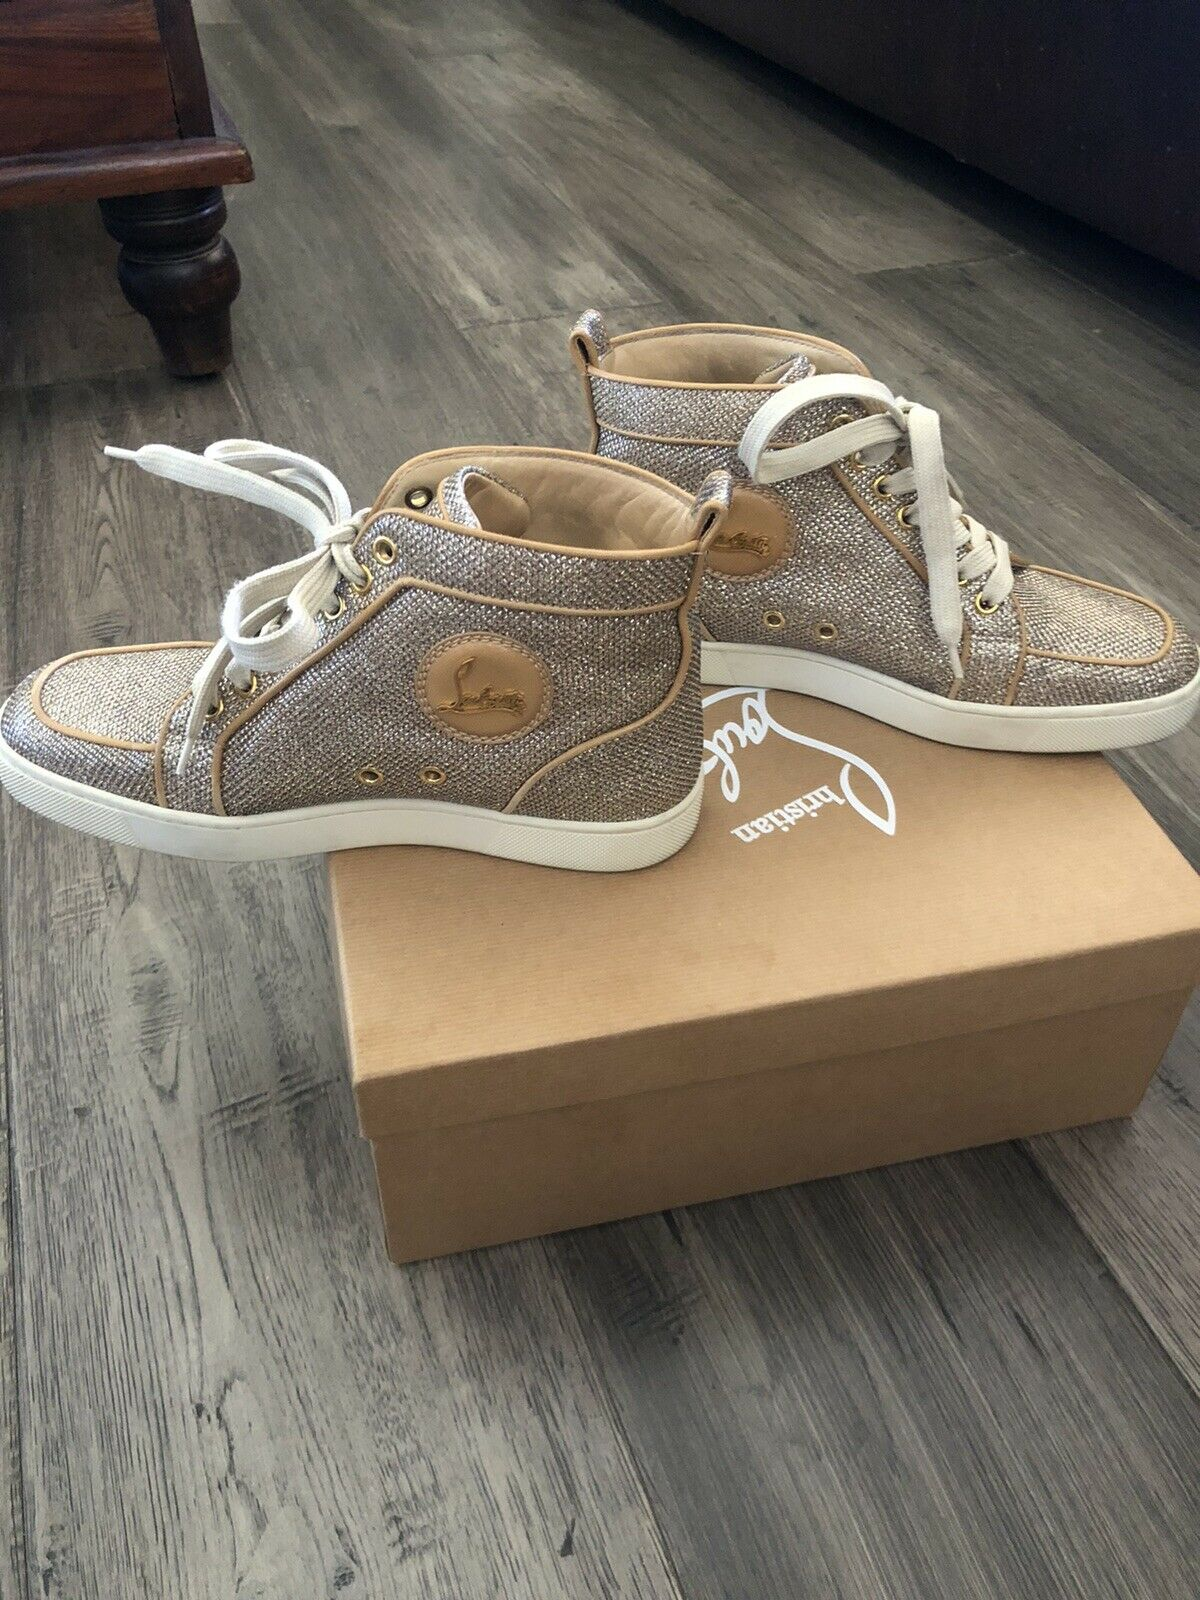 Christian Louboutin Women's Rantus Orlato Glitter Sneakers Gold Beige Size 38